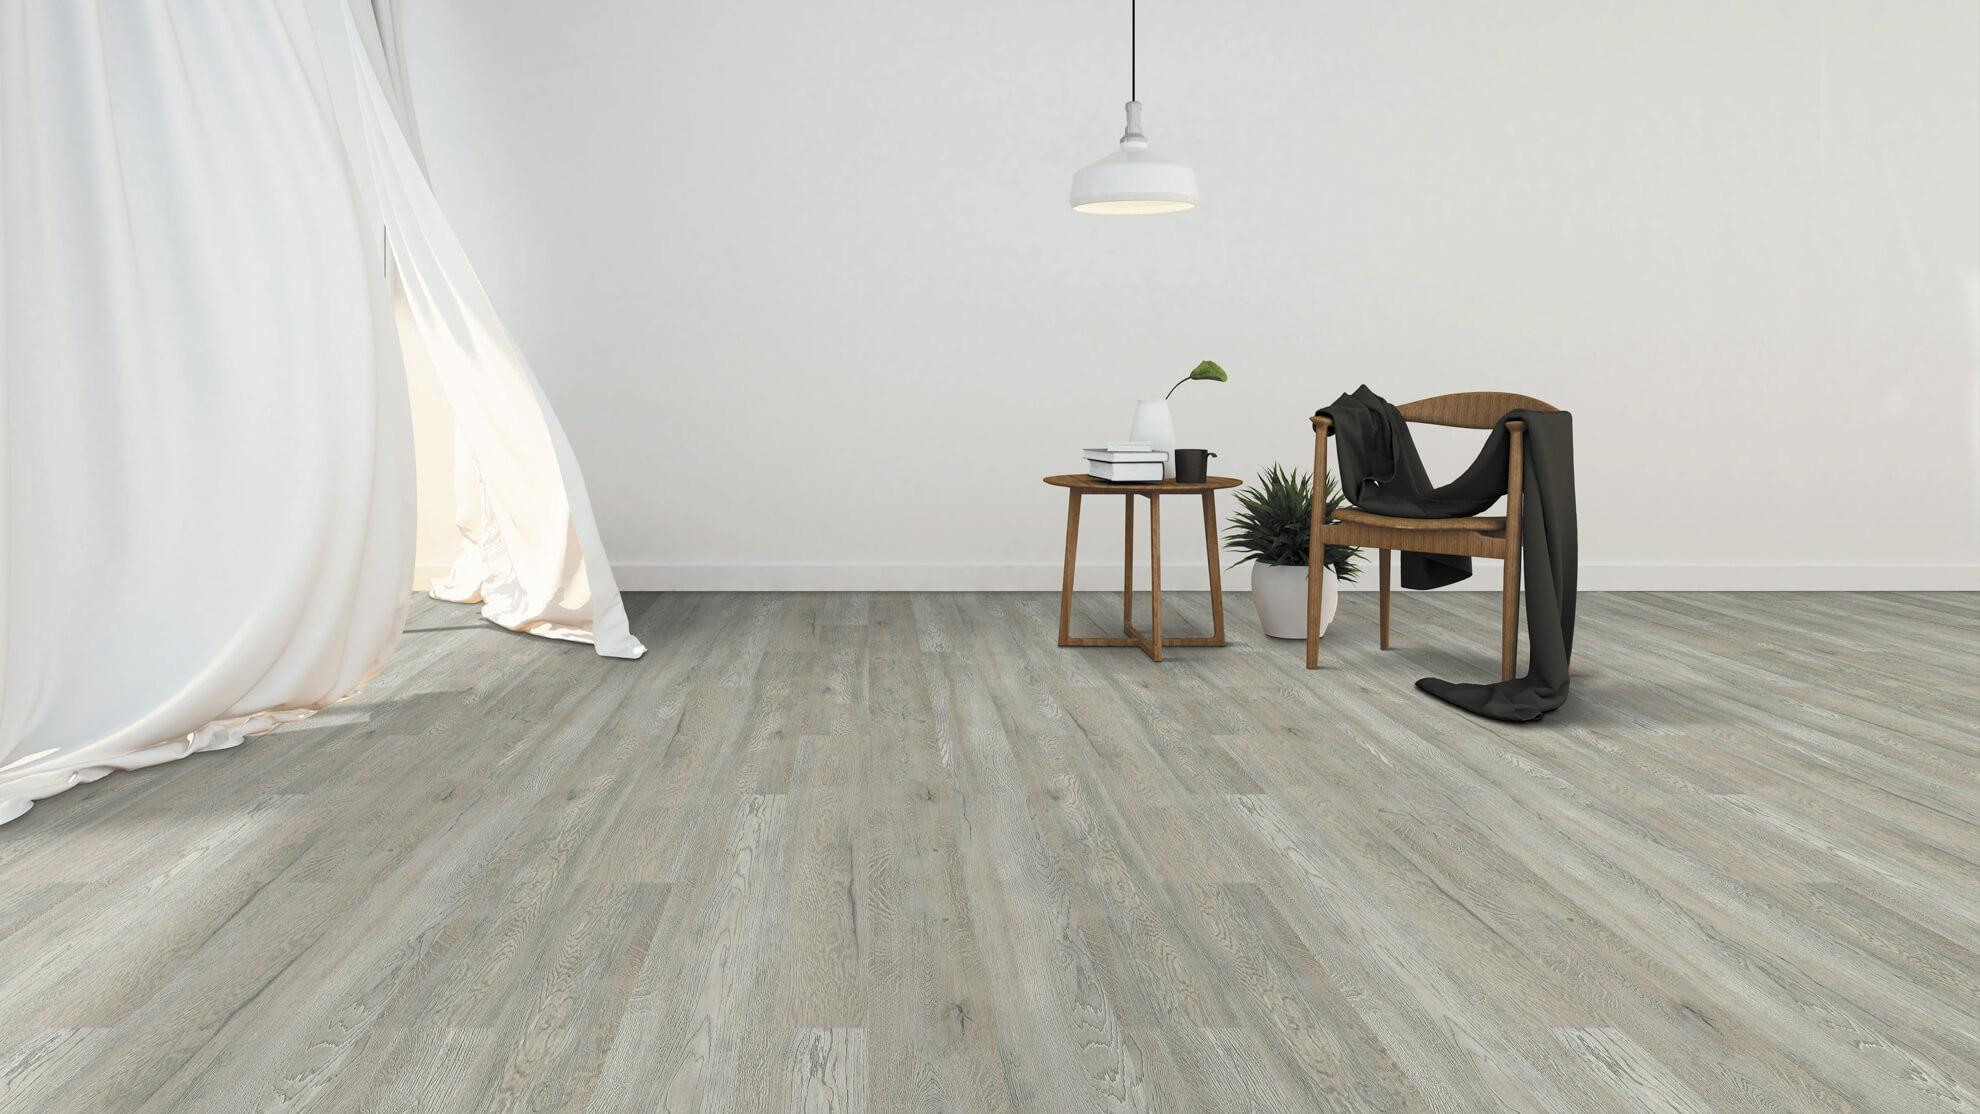 hardwood floor tile inlay of earthwerks flooring intended for noble classic plus alaska oak ncr 9708